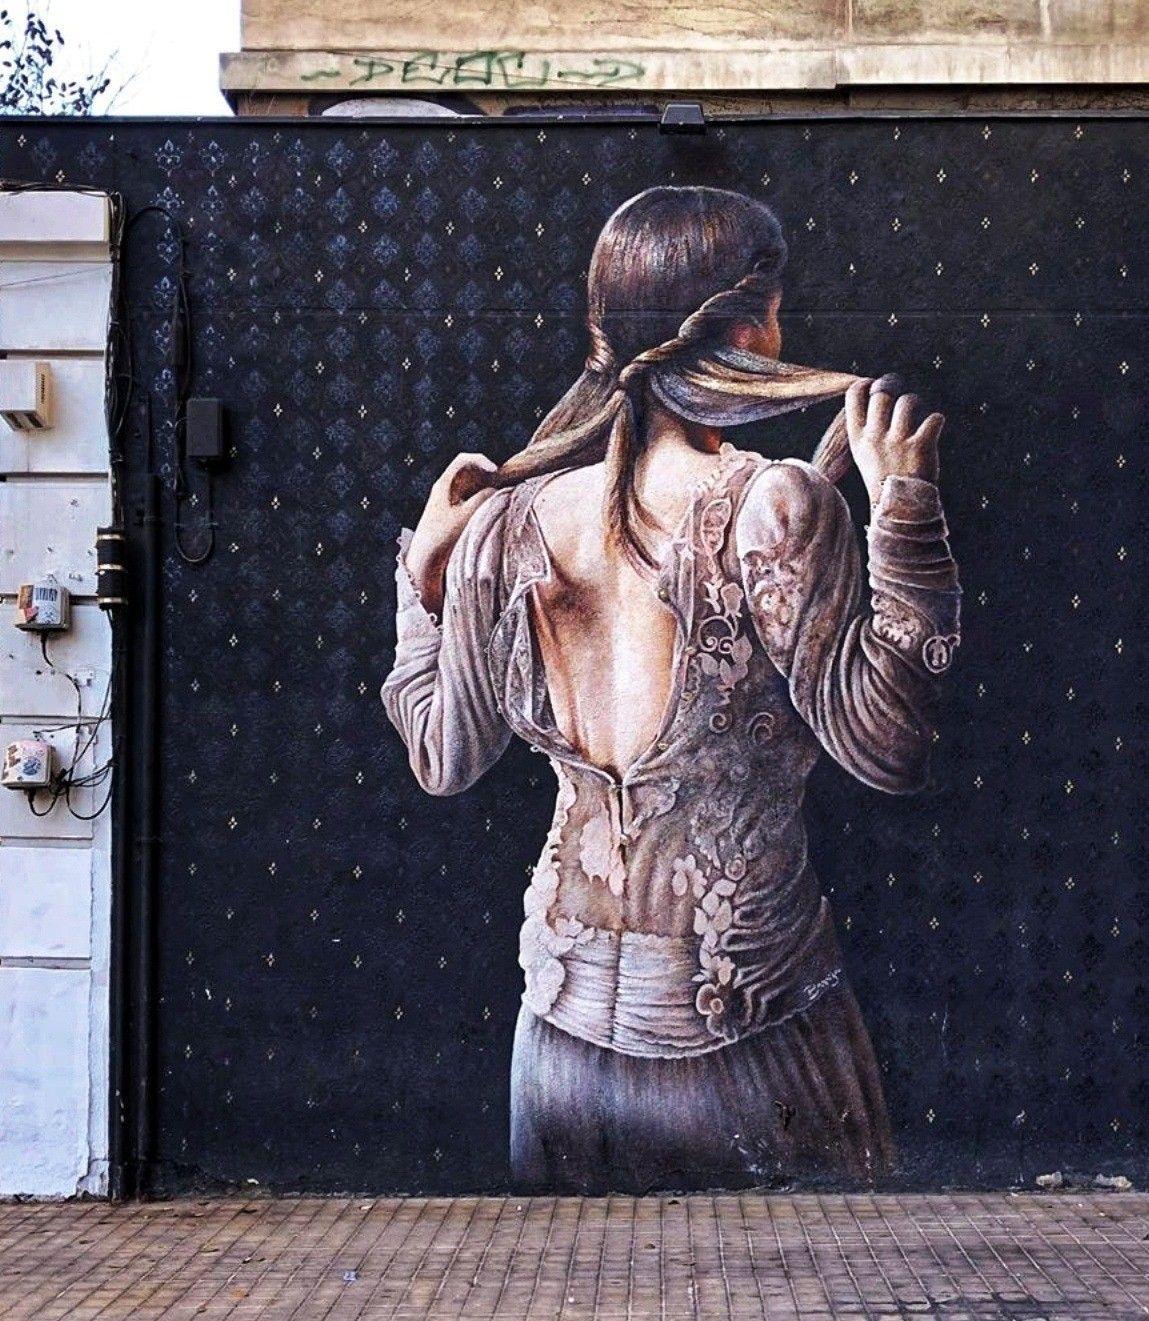 Javier Barriga Arte Callejero Arte Urbano Y Murales Graffiti